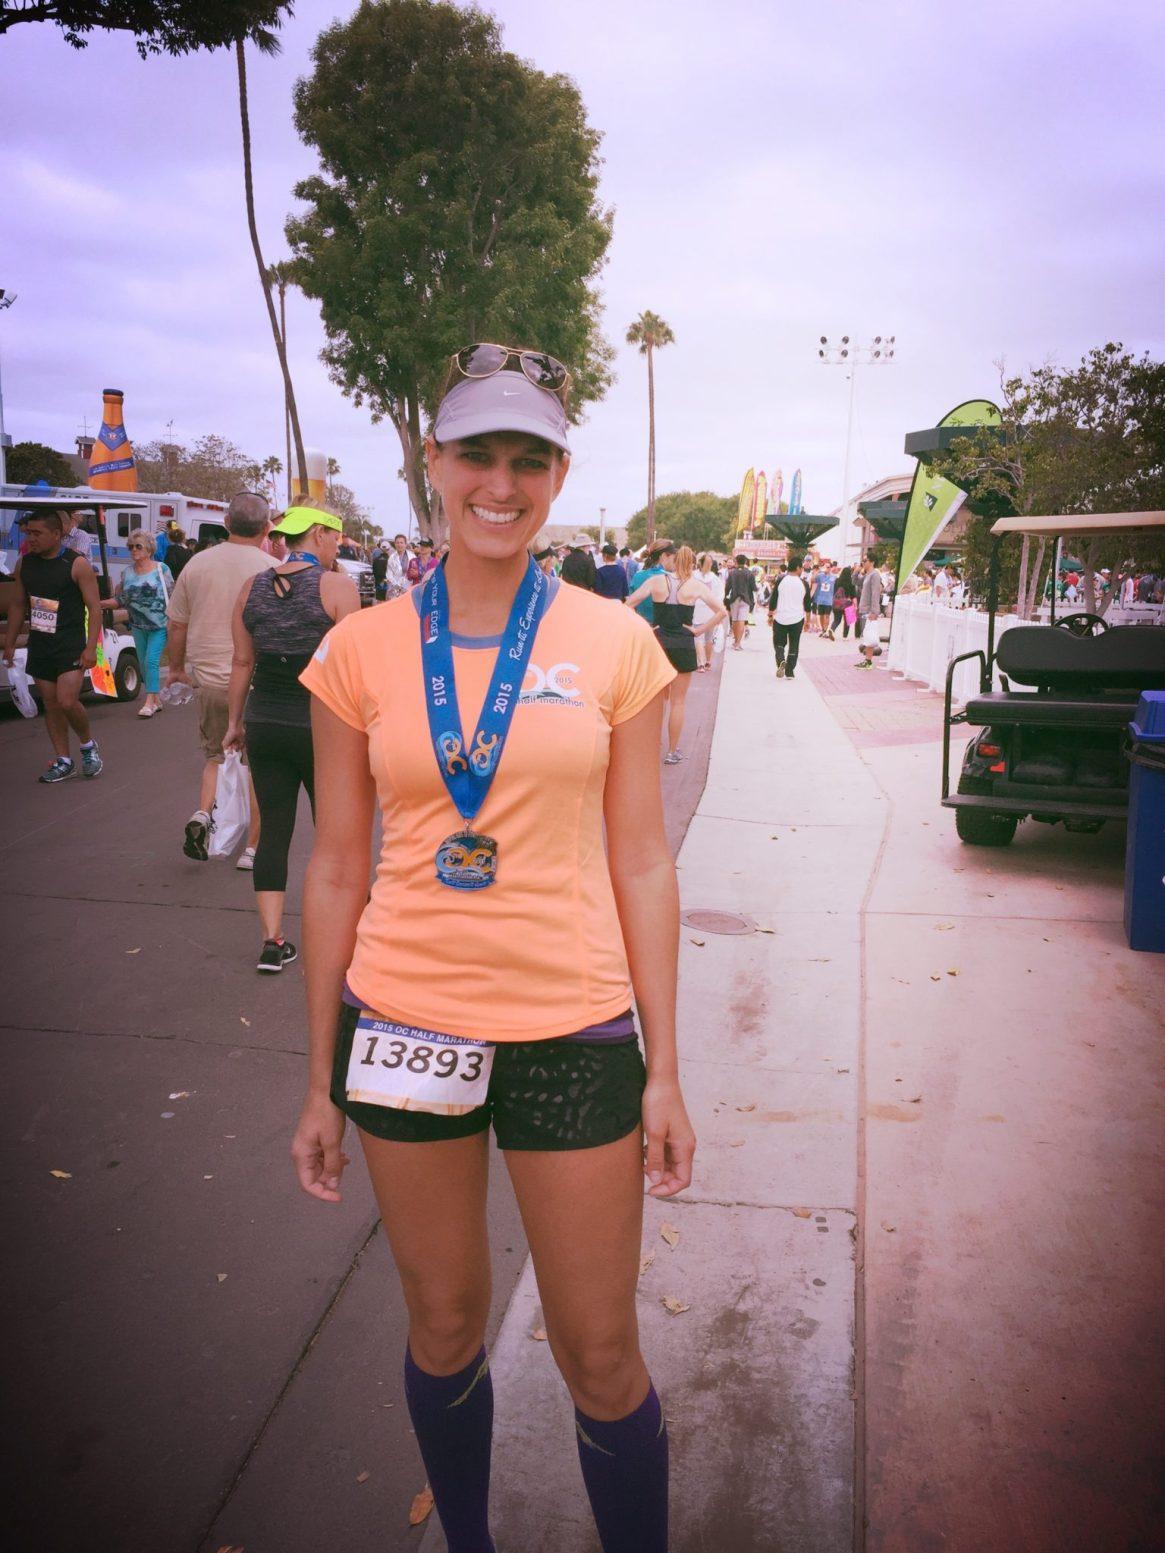 OC Marathon, Half Marathon, Medal, Race Shirt, Post Race Photo